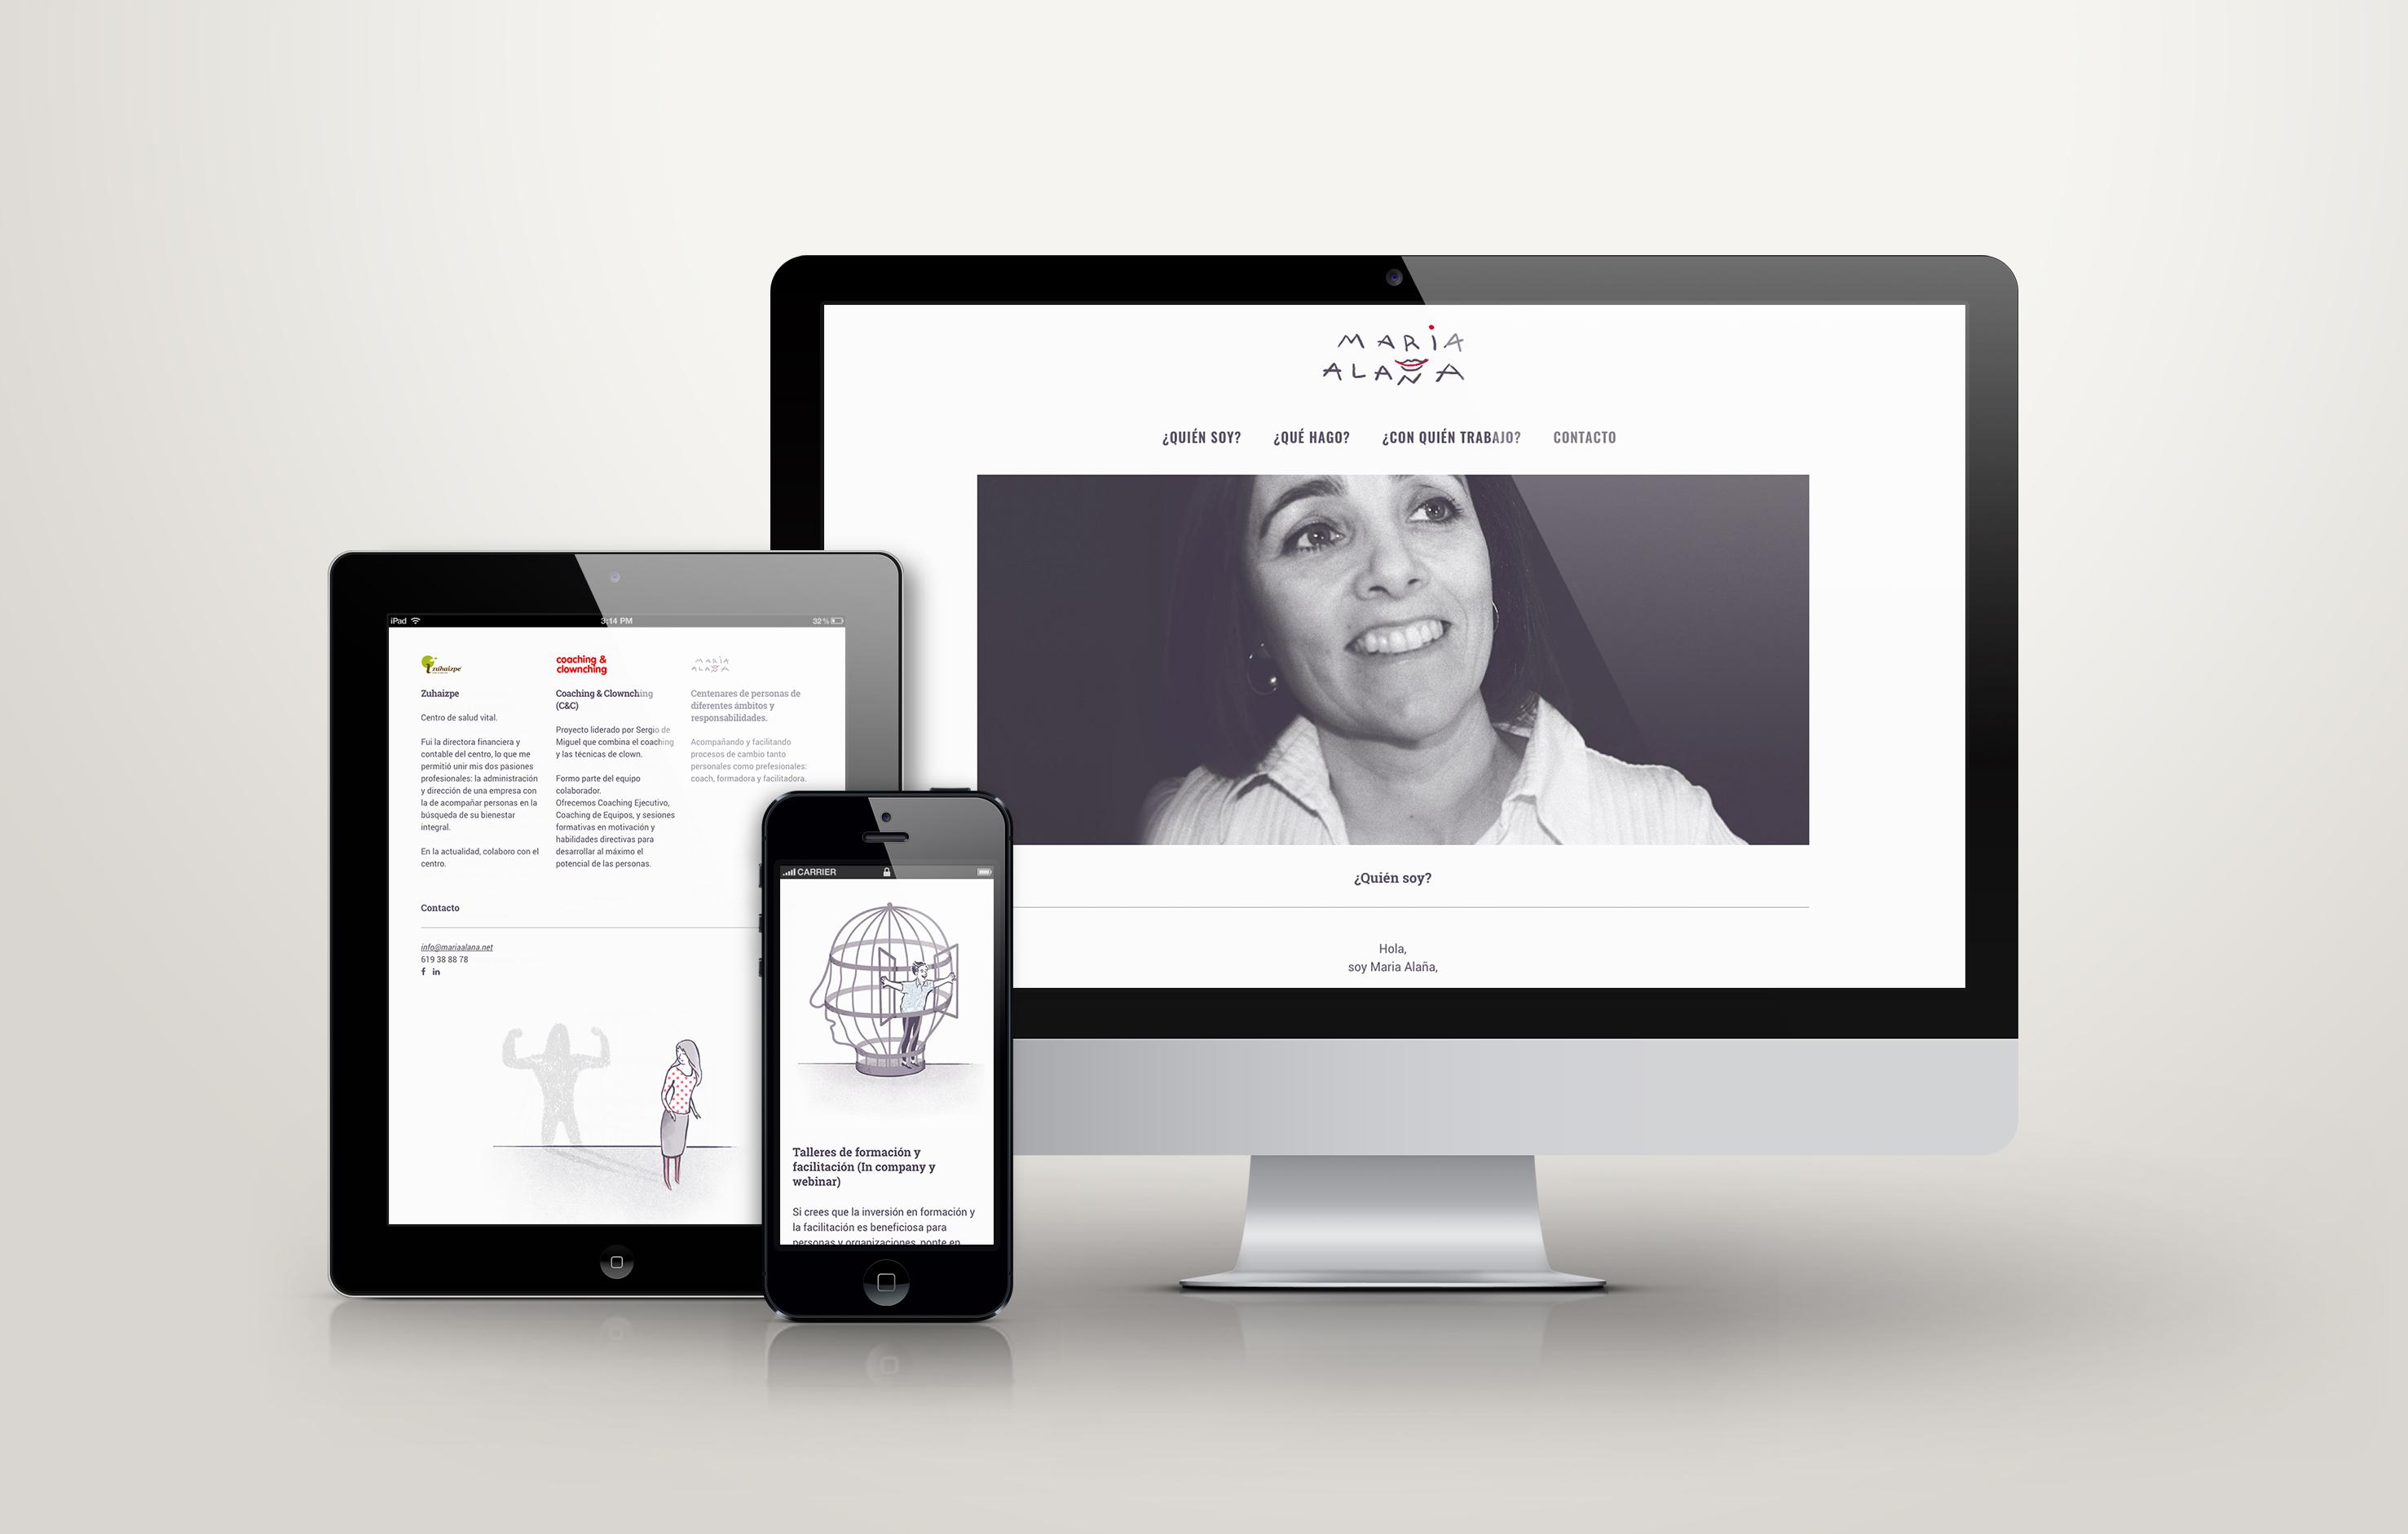 Web Maria Alaña, coach by Nagore M. Jauregi - Creative Work